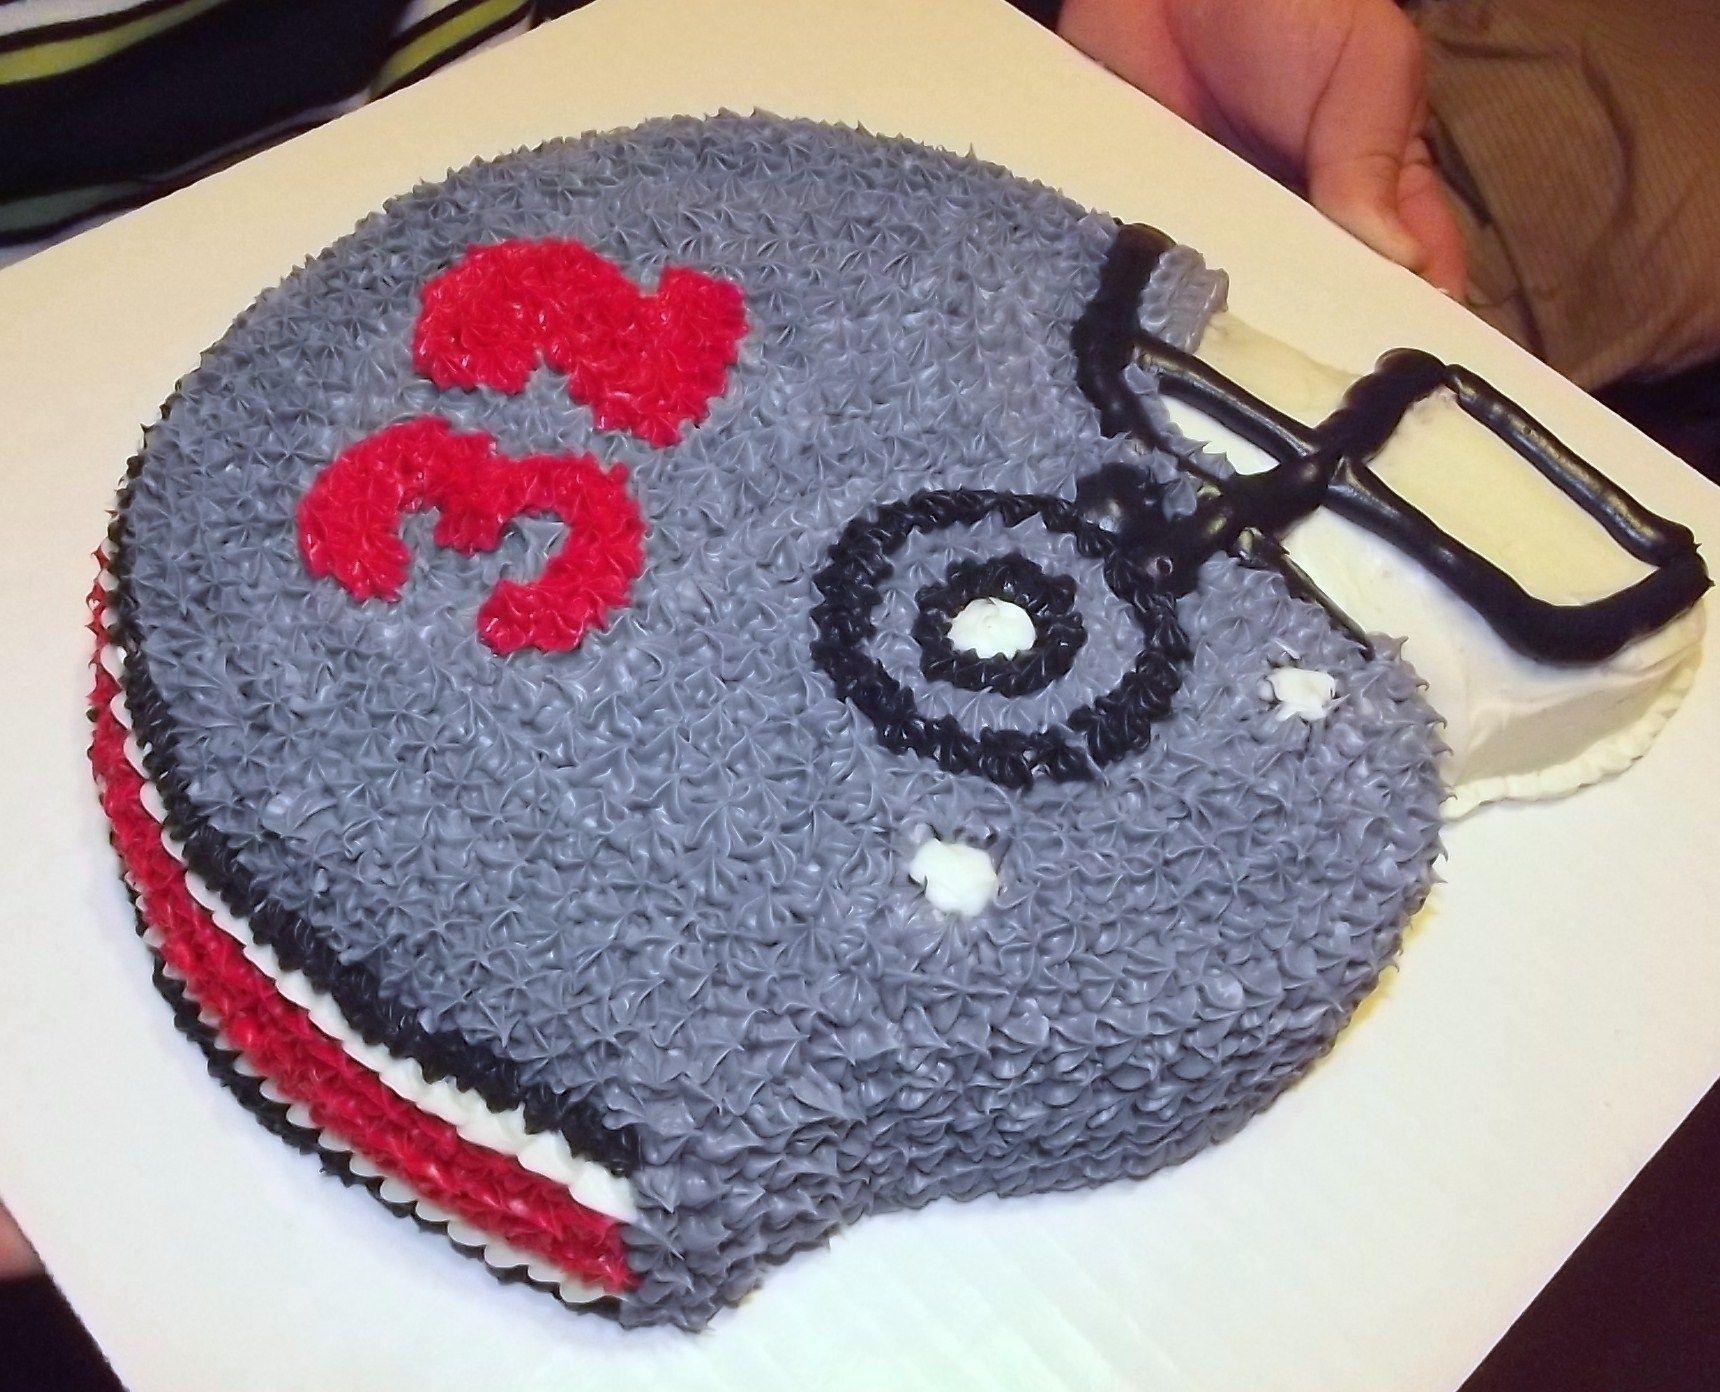 Football Helmet Cake cake decorating Pinterest Football